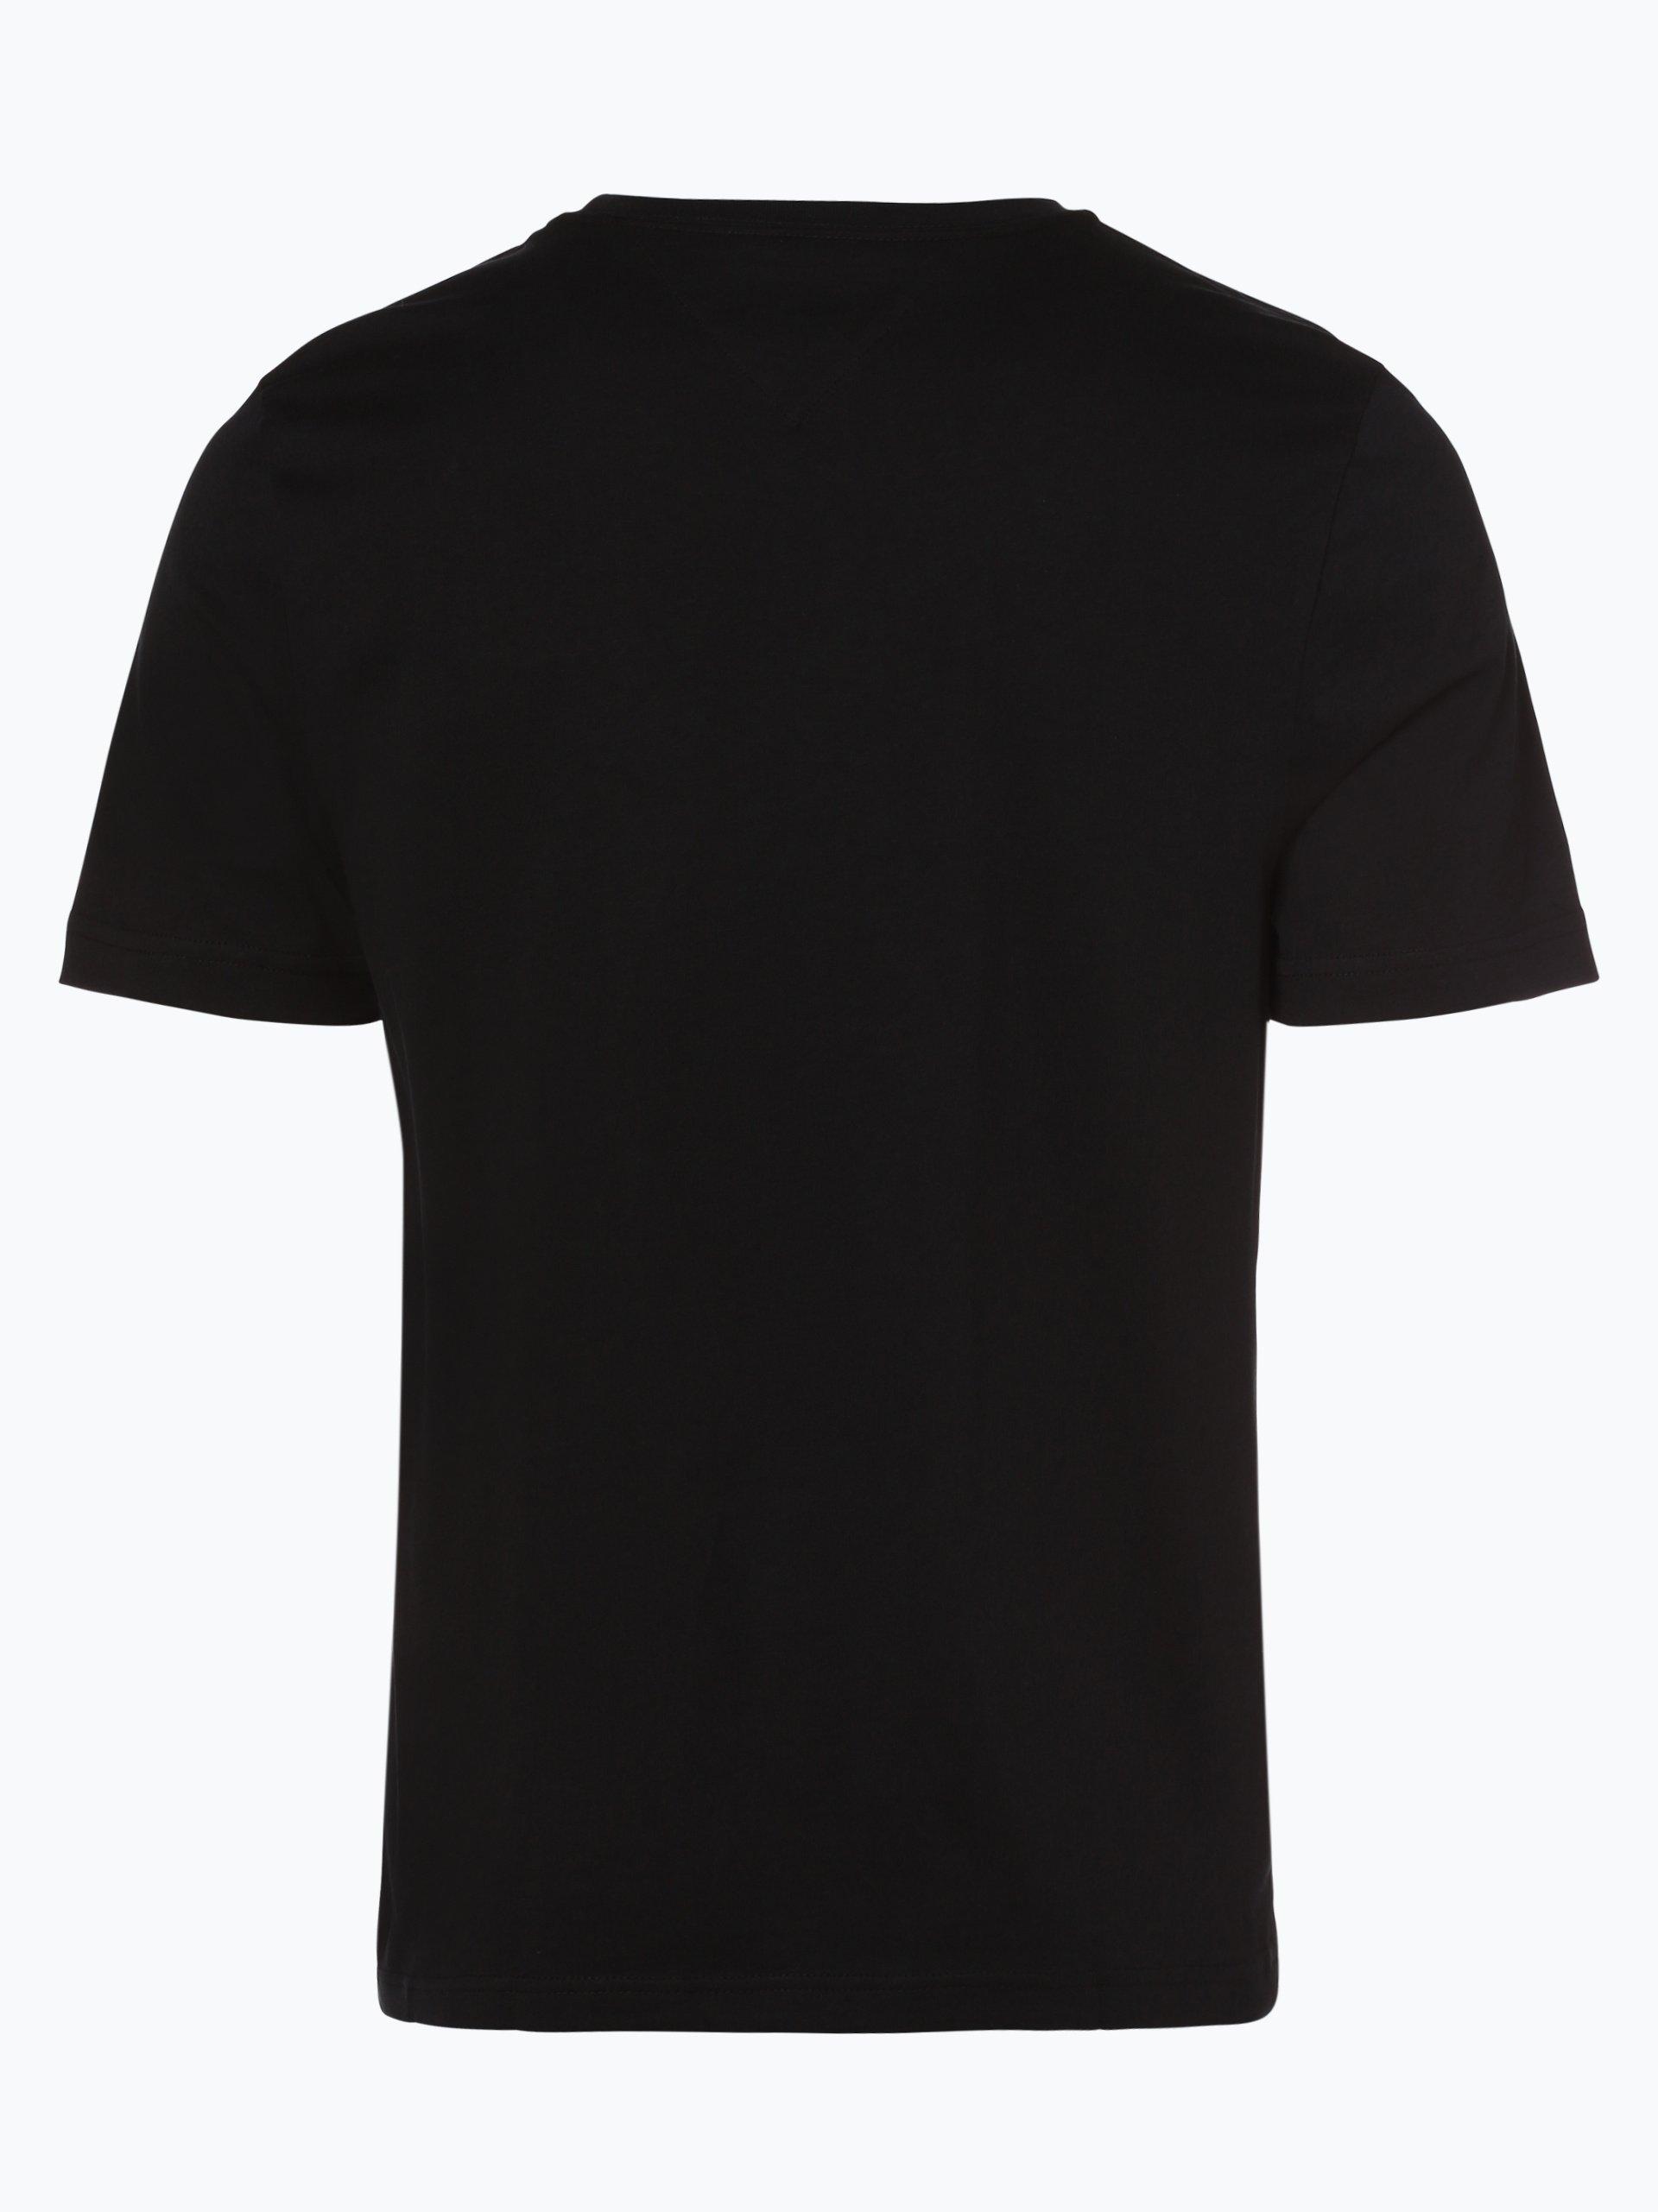 tommy hilfiger herren t shirt schwarz bedruckt online kaufen vangraaf com. Black Bedroom Furniture Sets. Home Design Ideas